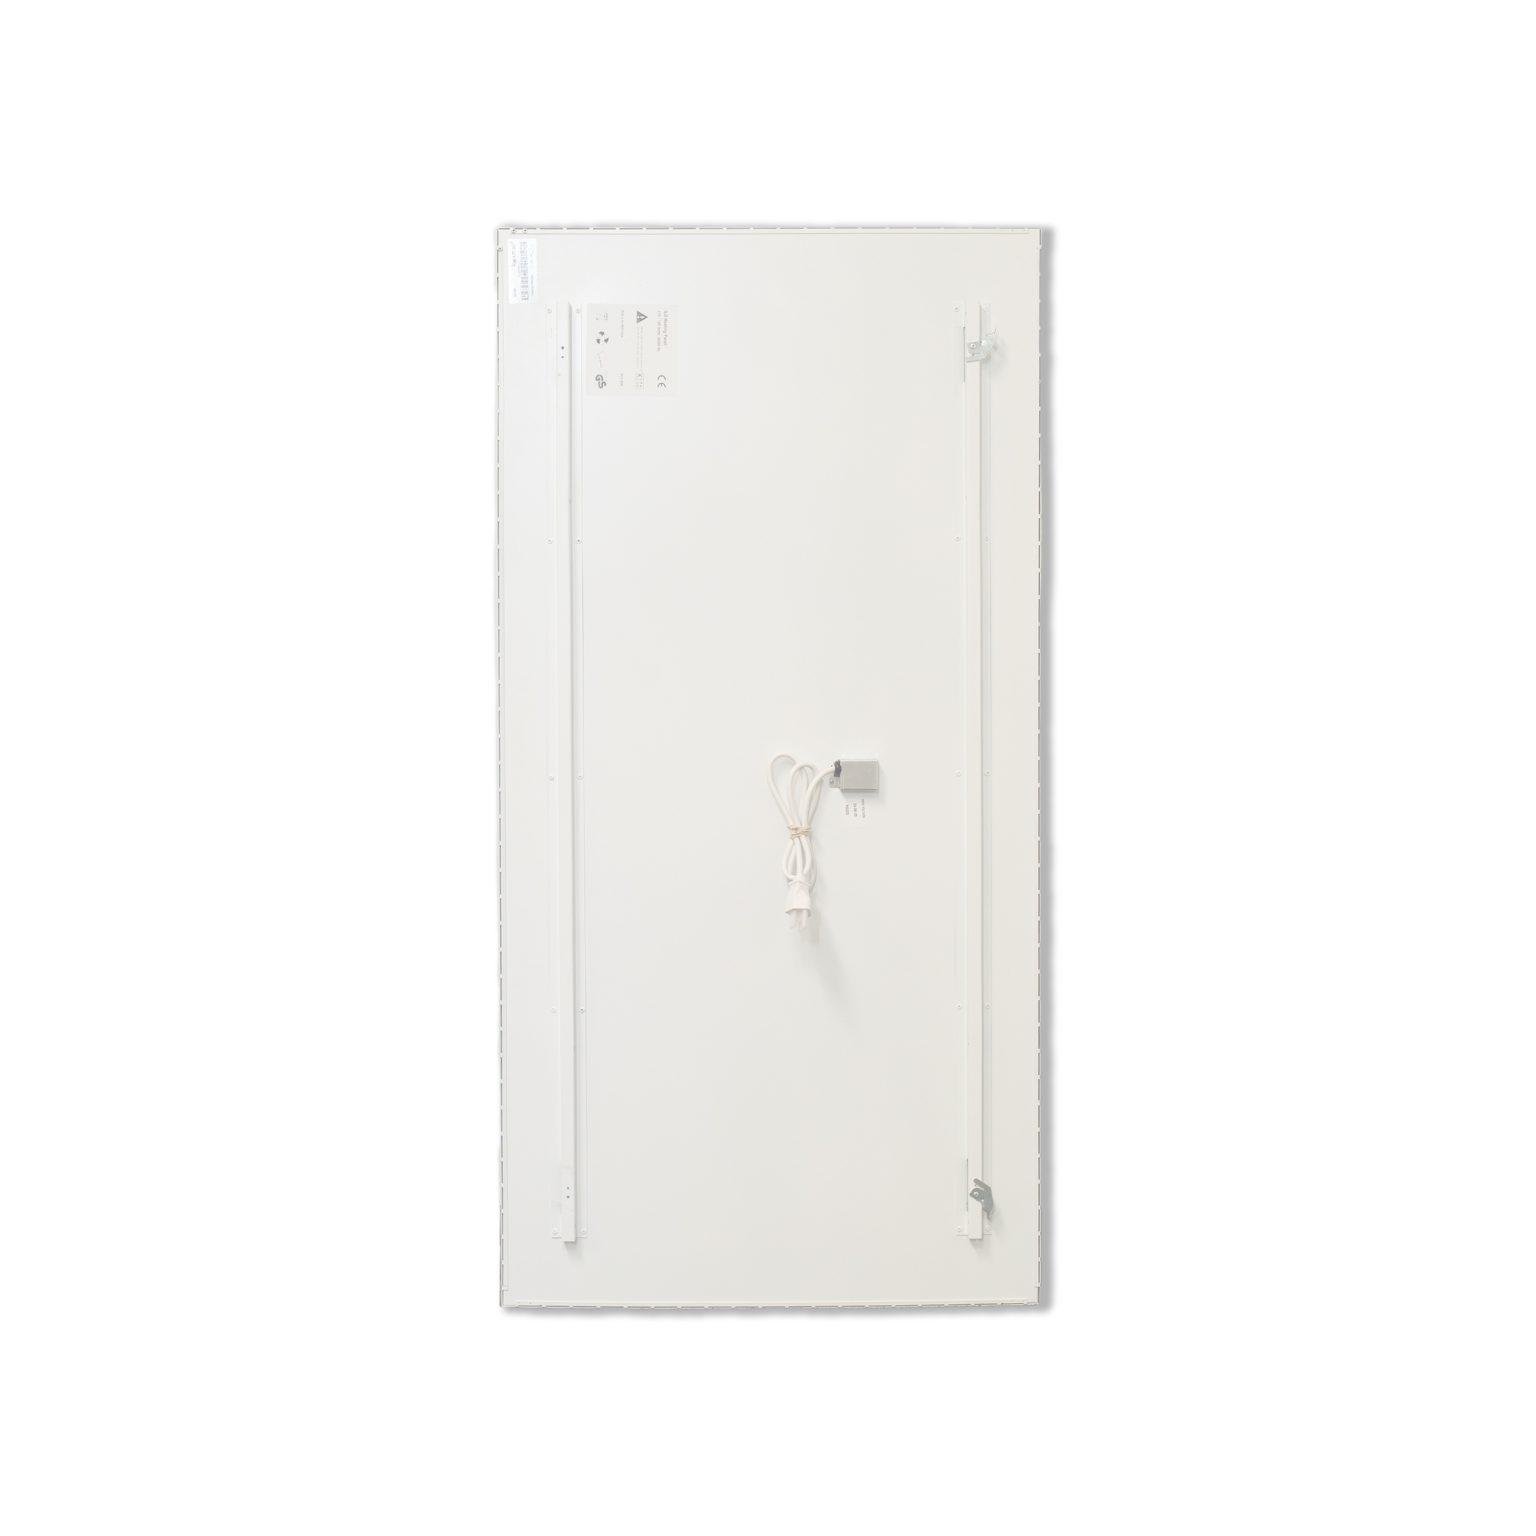 "SI Series 24"" x 48"" 750 Watt Aluminum Panel - Back View"